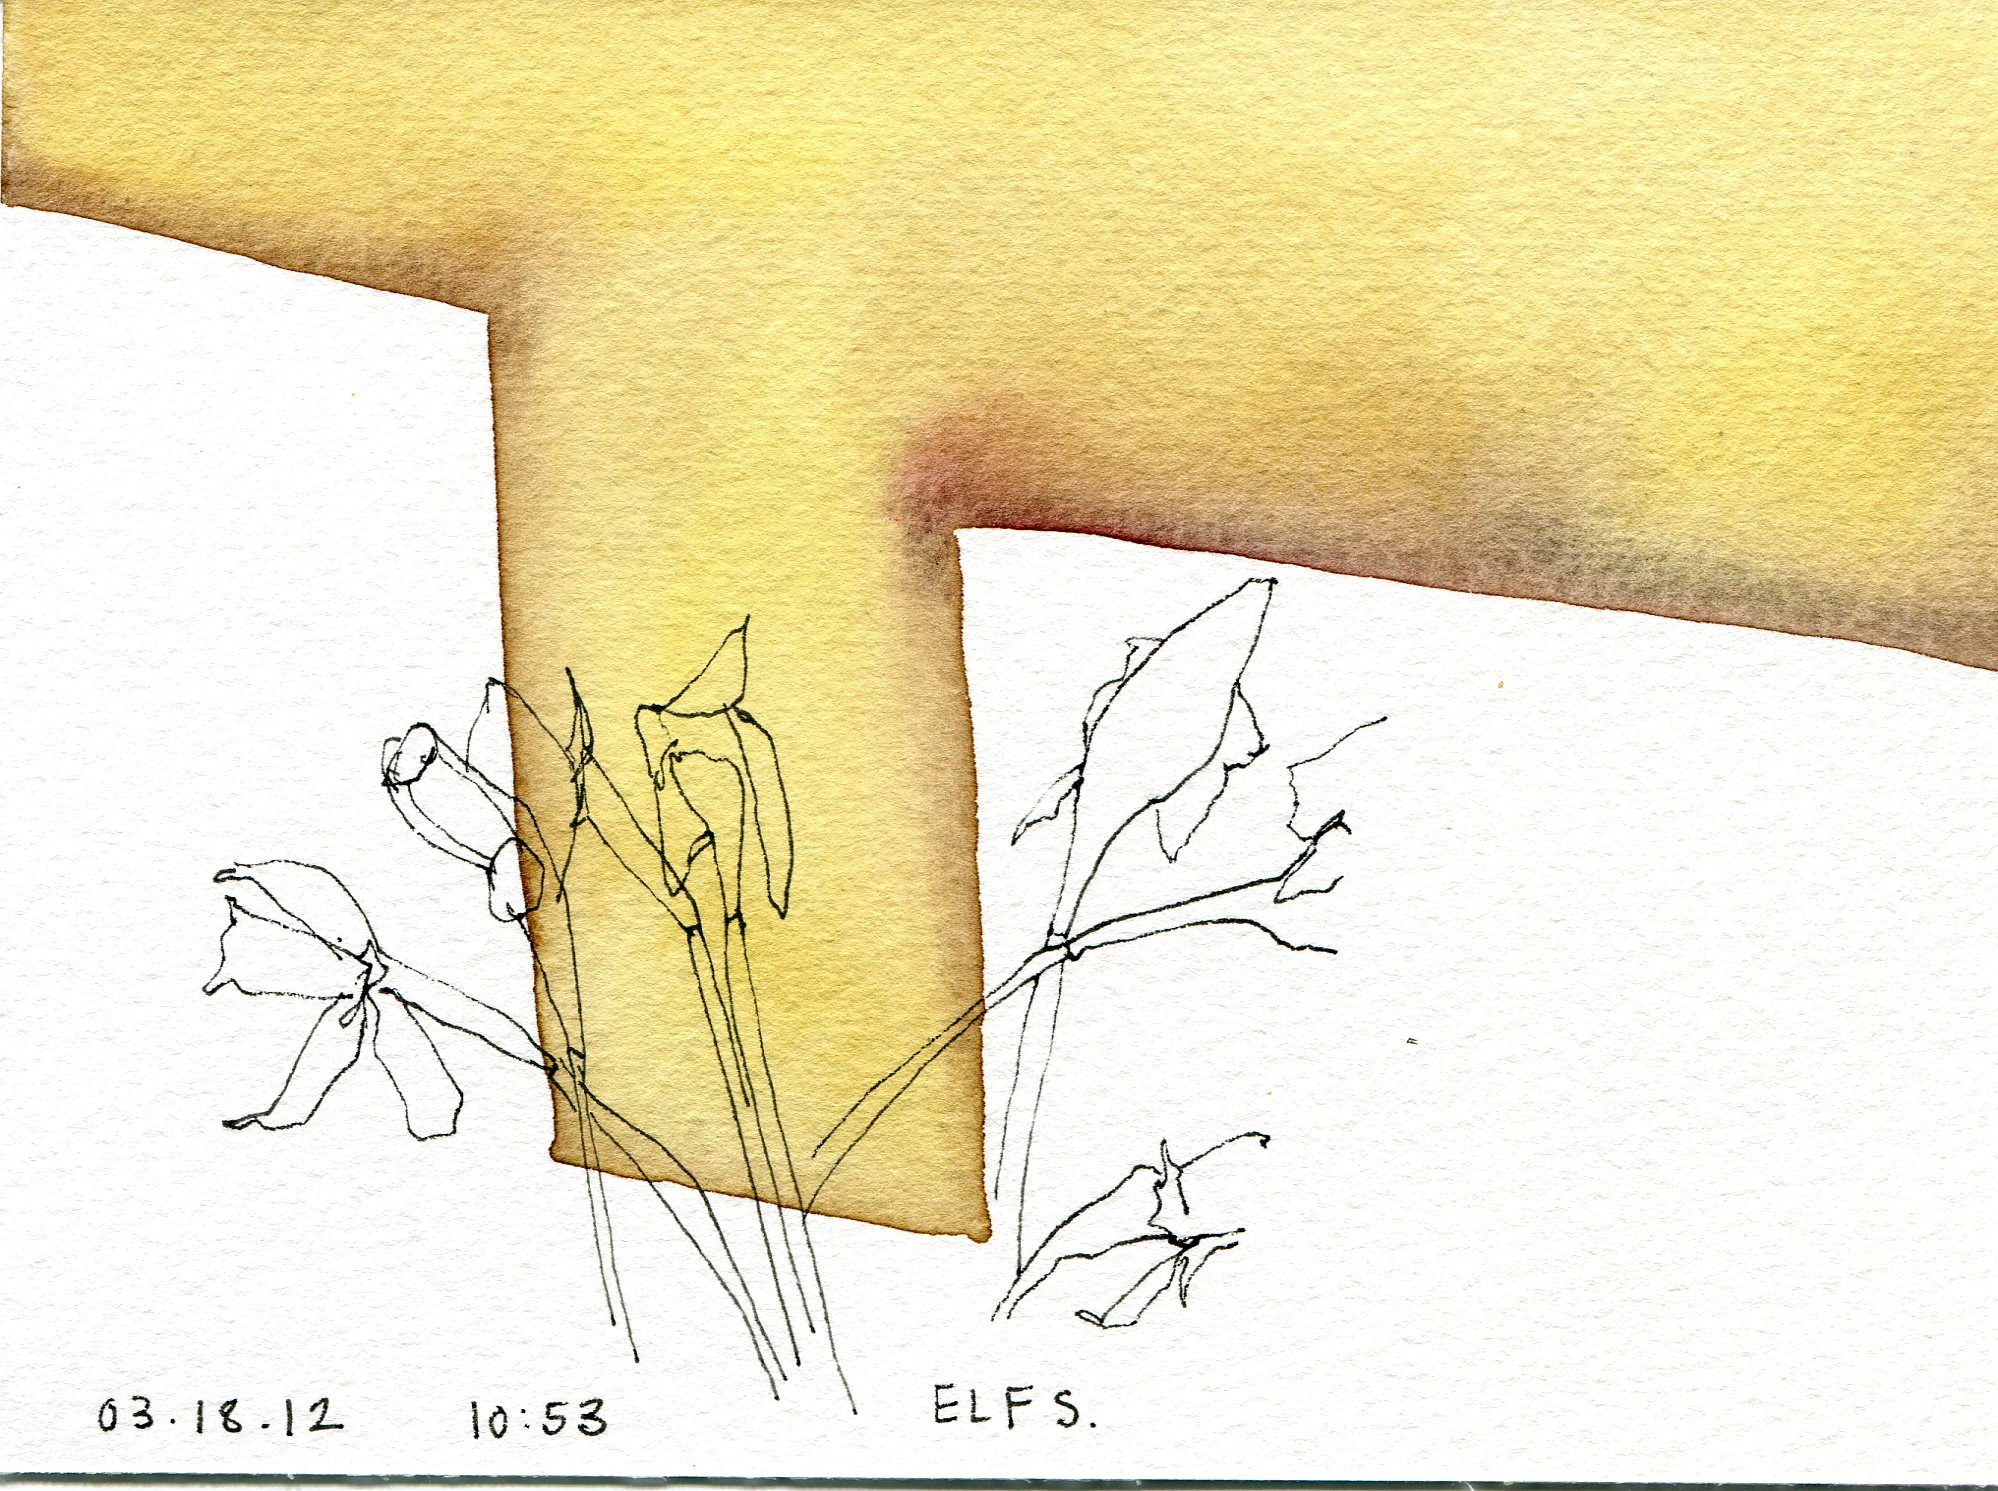 2012-03-23 drawing001.jpg